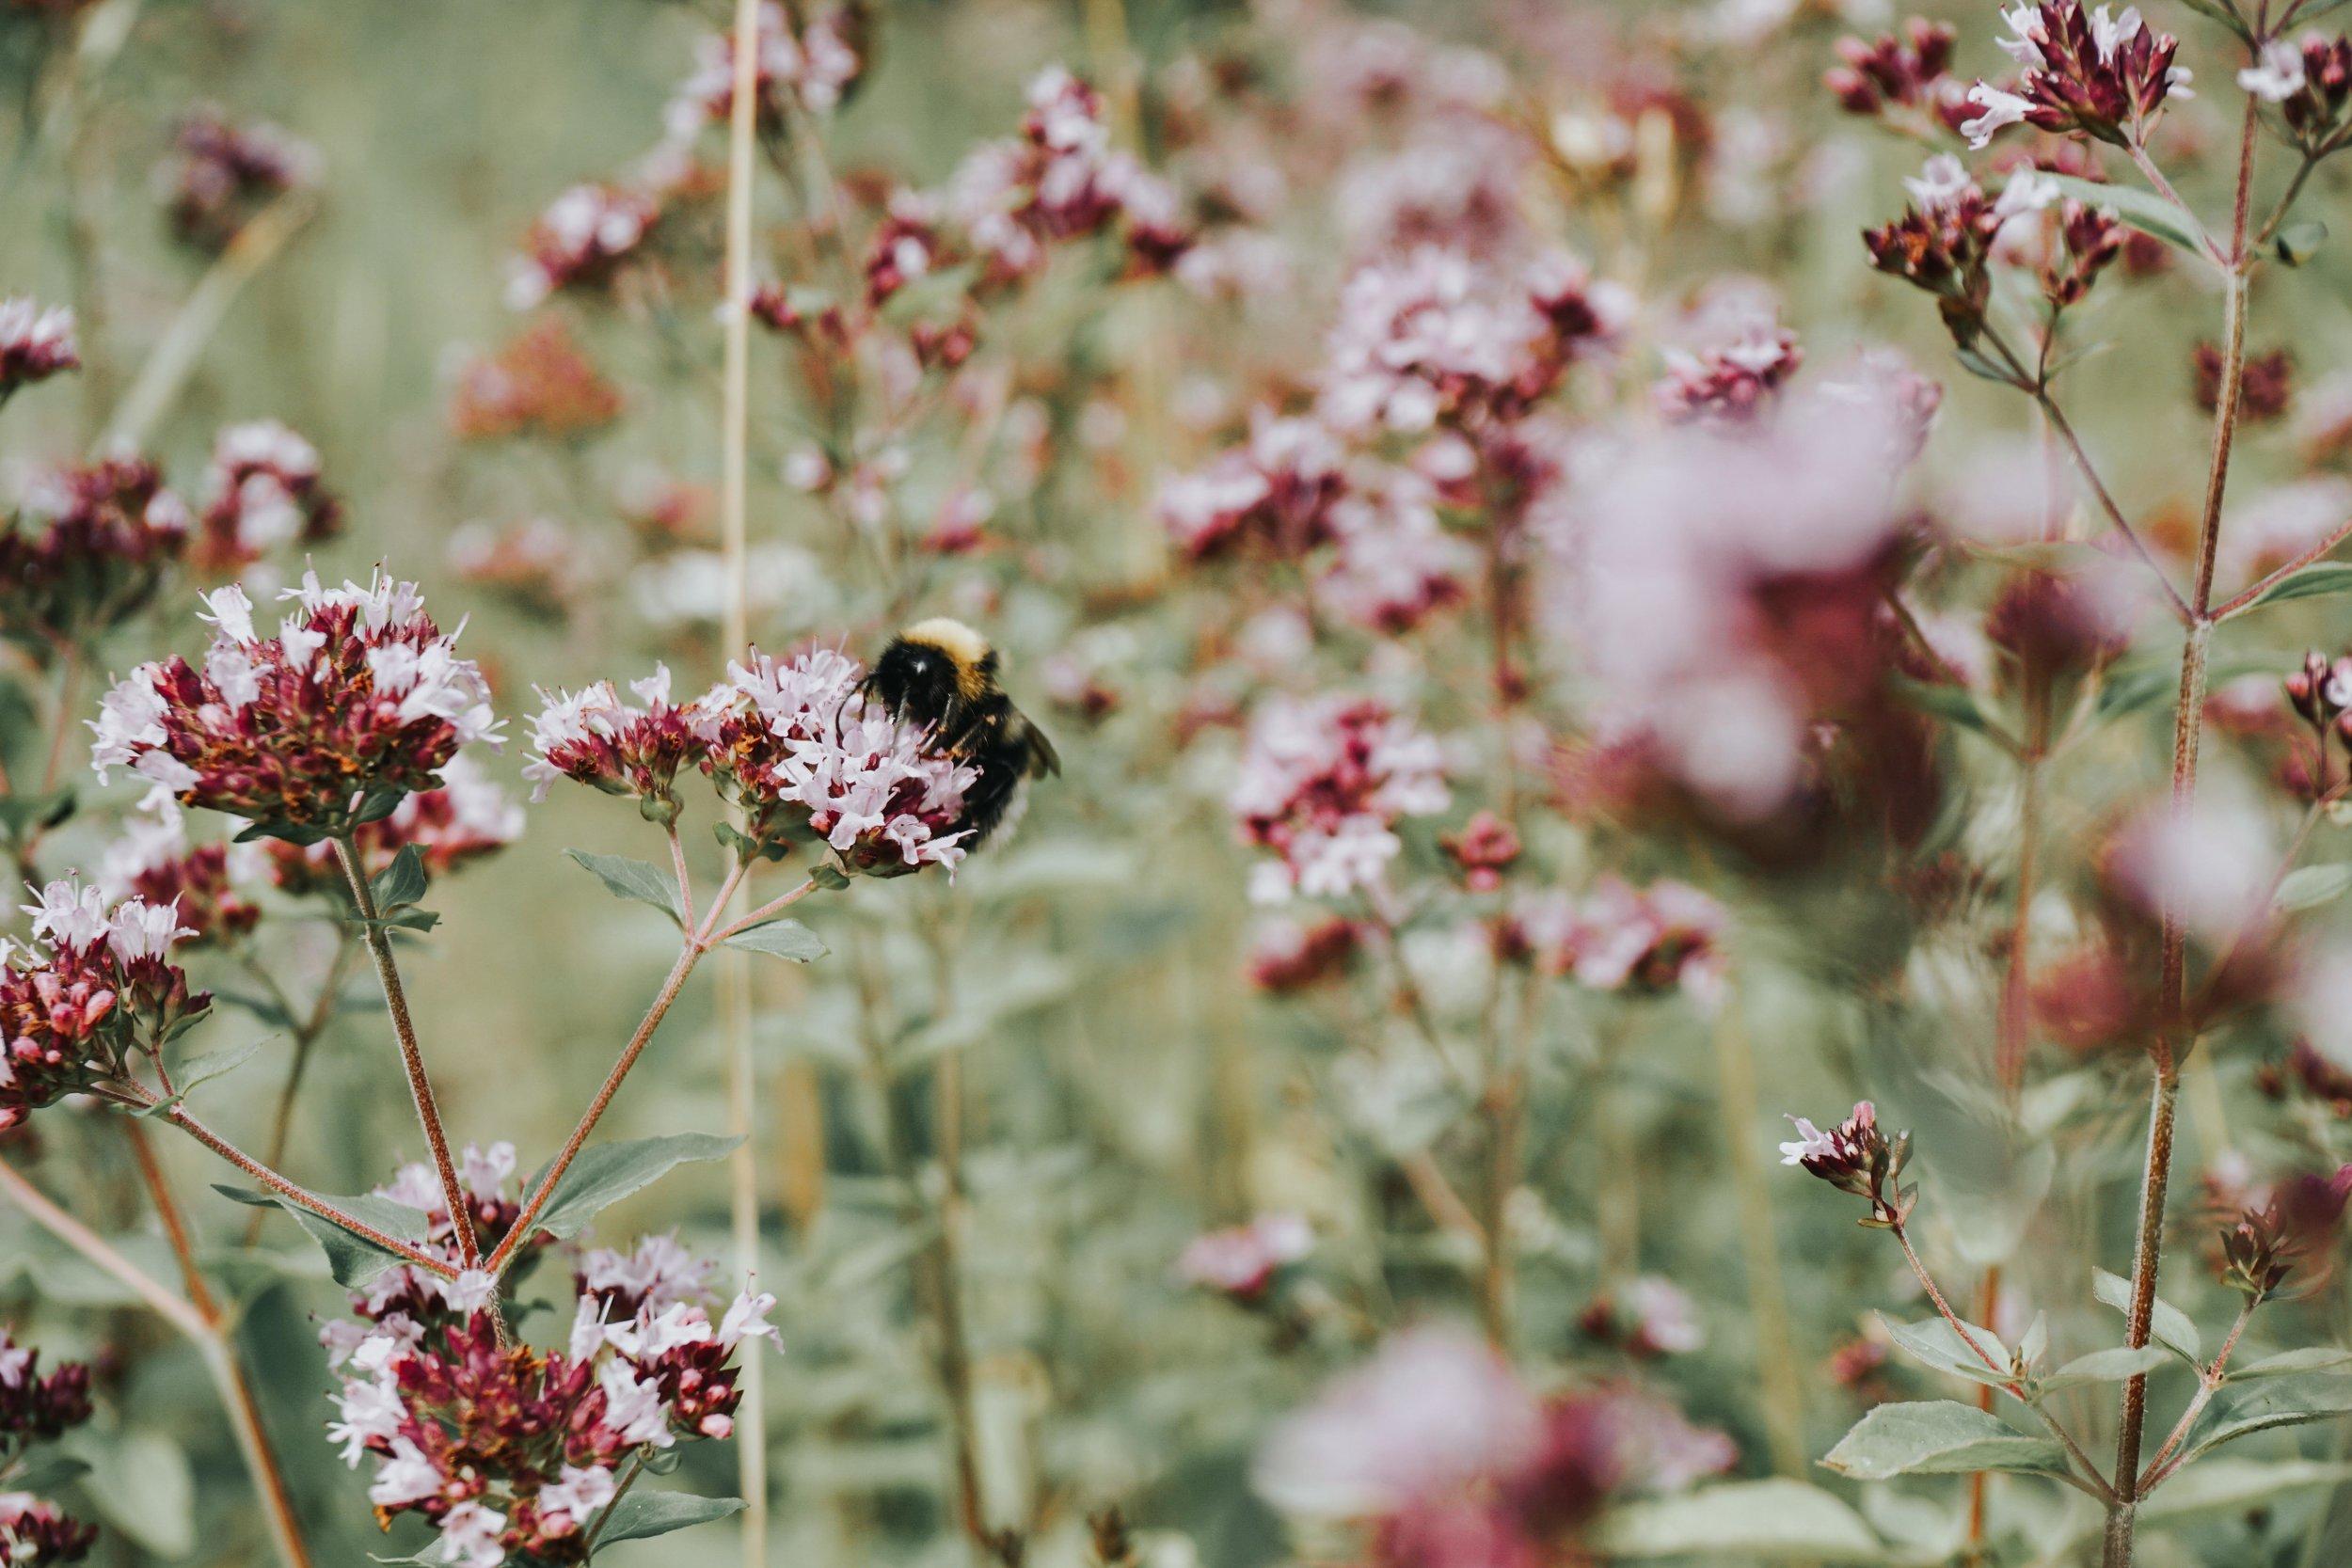 honeybee-gathering-nectar.jpg